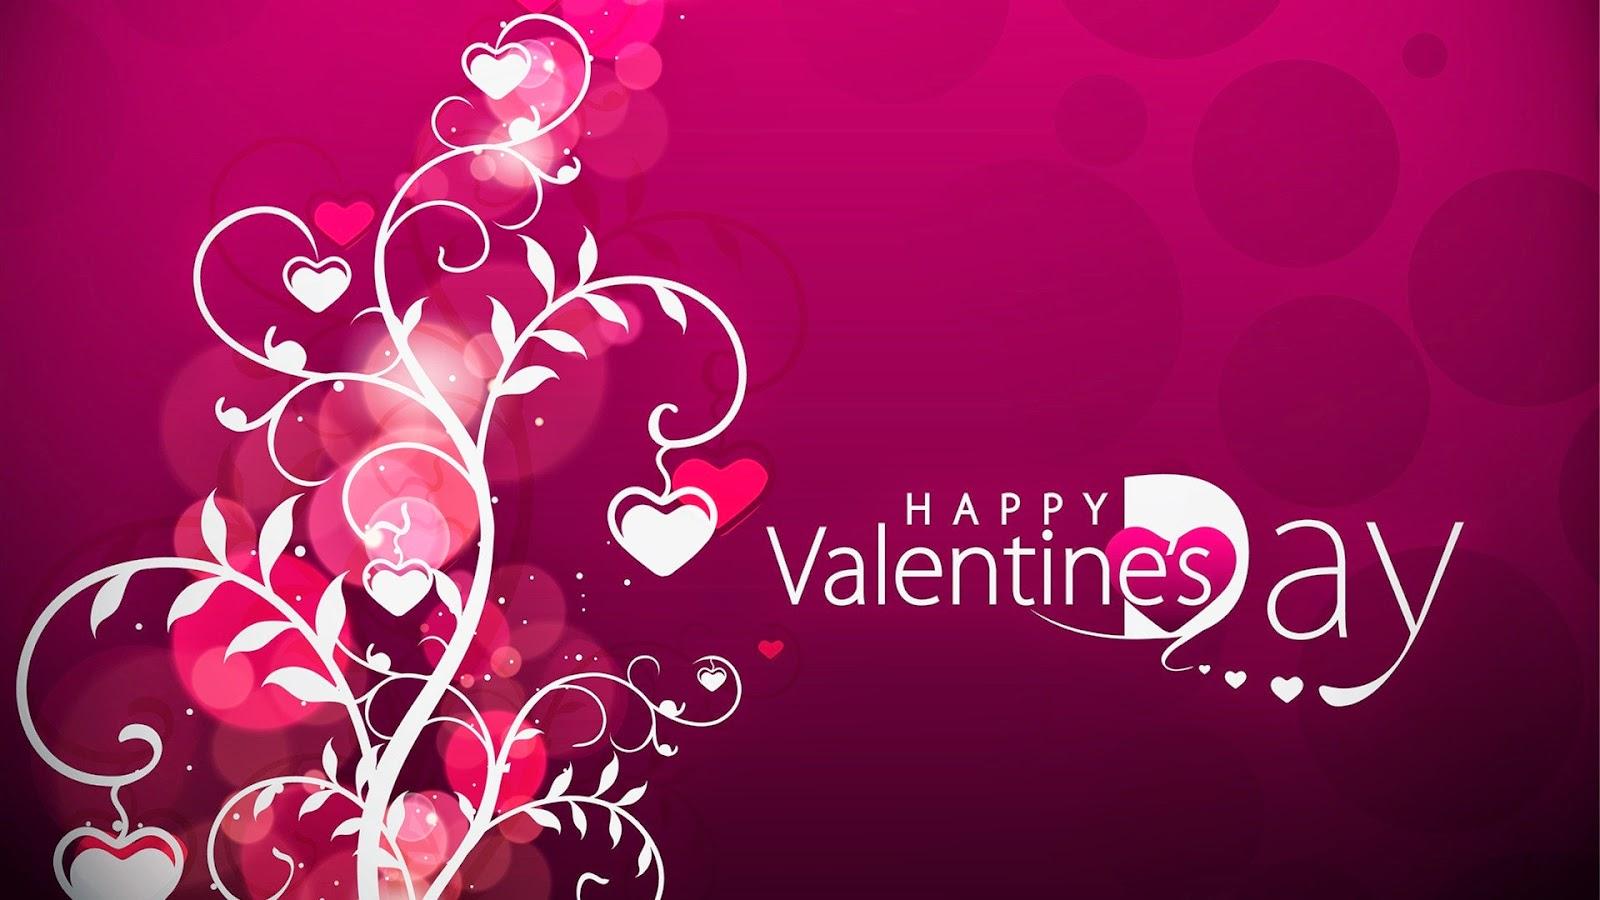 Happy-Valentines-Day-Wallpaper.jpg